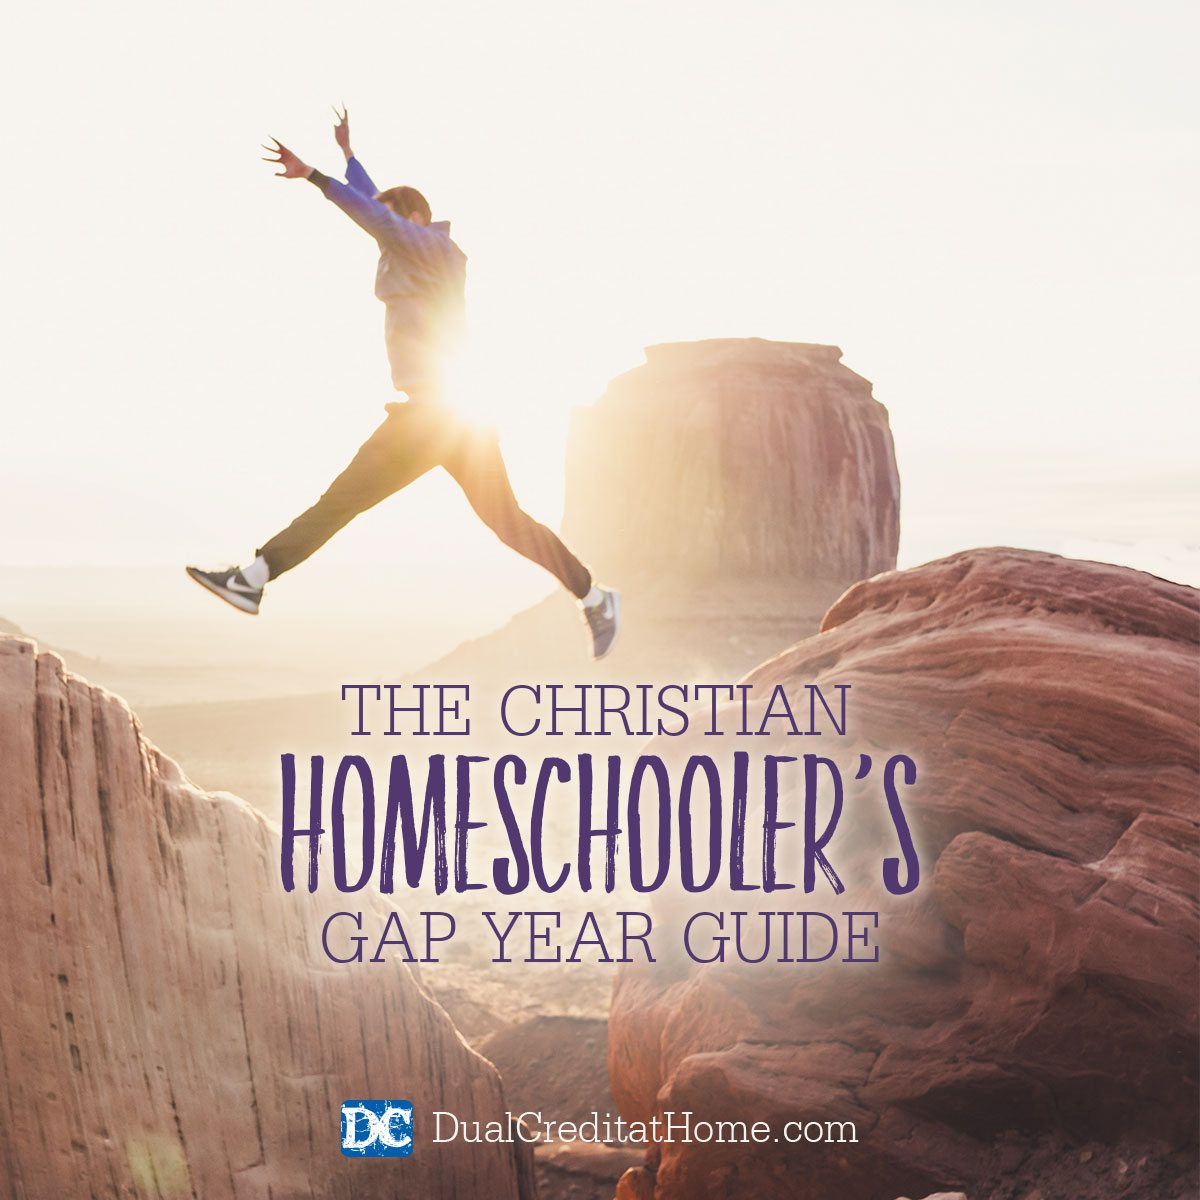 Christian Homeschooler's Gap Year Guide